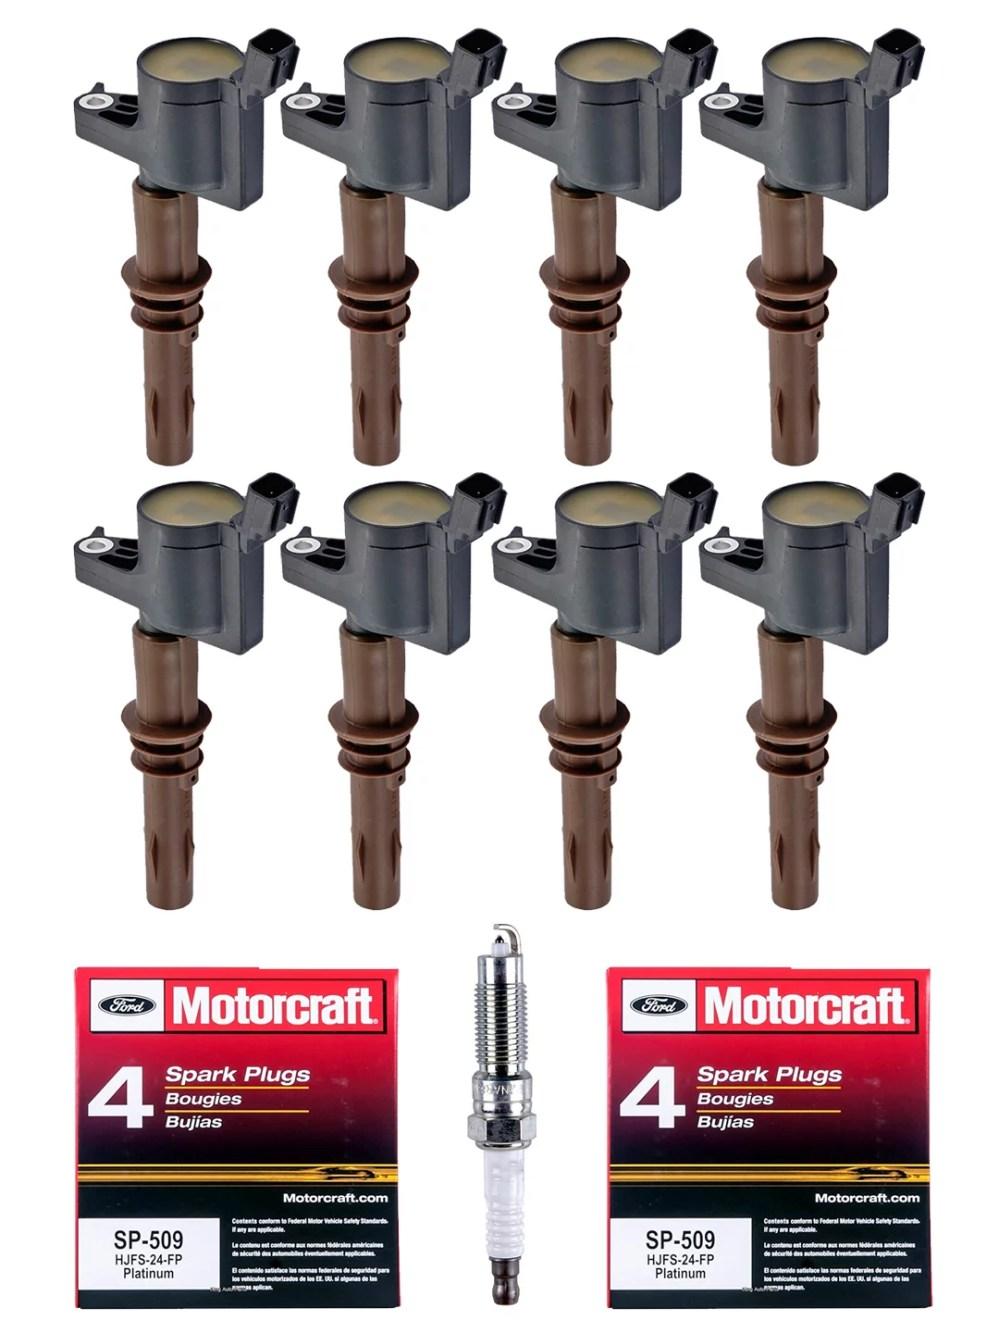 medium resolution of set of 8 ignition coils with brown boot motorcraft spark plugs sp509 for 2008 2014 lincoln navigator 5 4l v8 walmart com